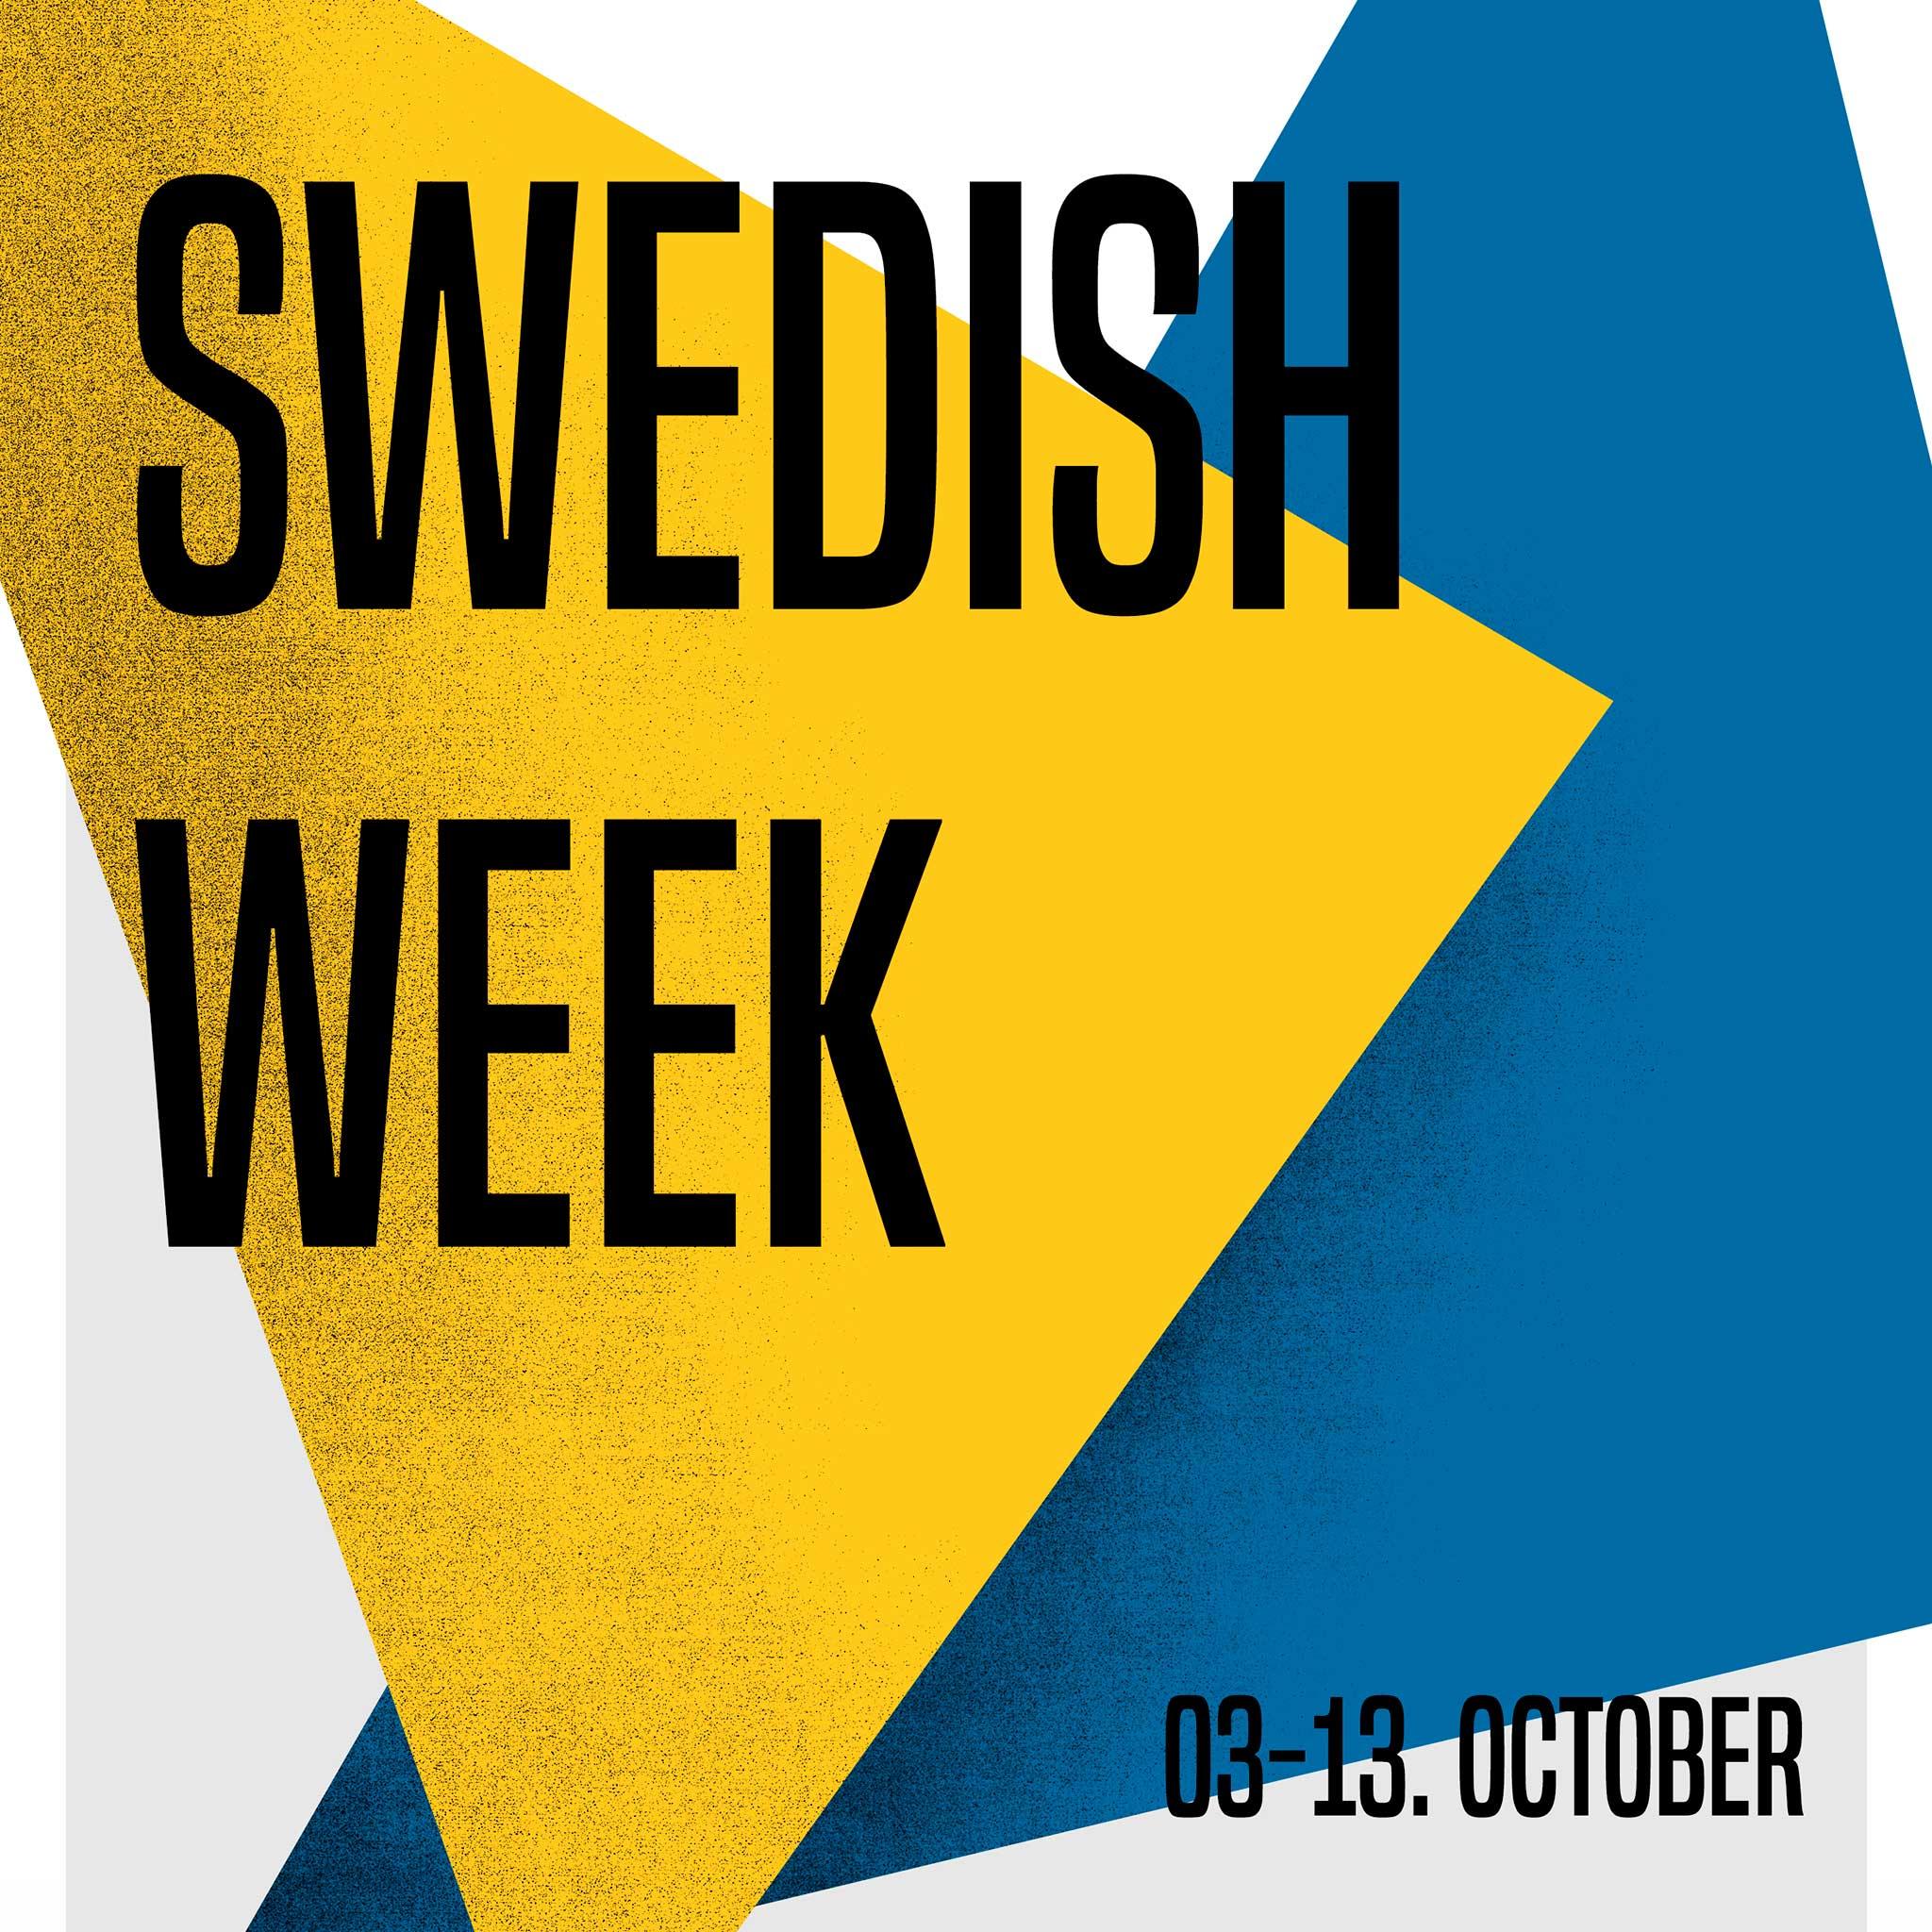 The Swedish Week